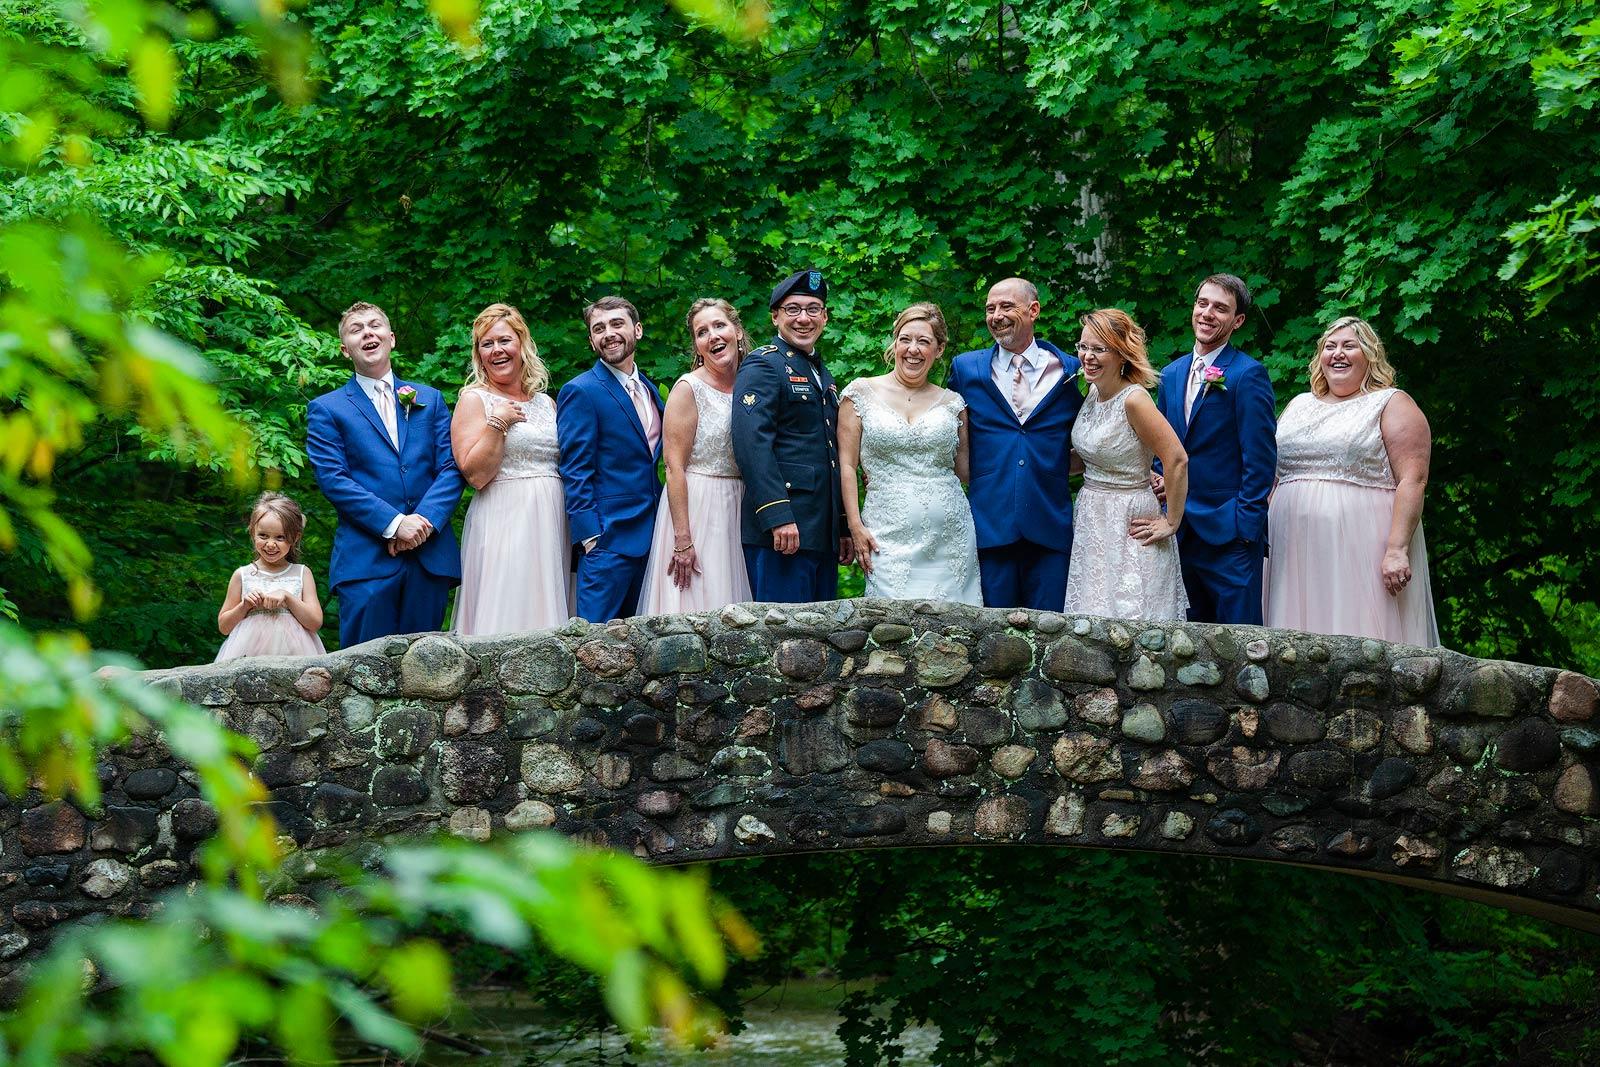 Wedding Photography - Fun Shot of Wedding Party on Stone Bridge - Paul Dekort Photographer